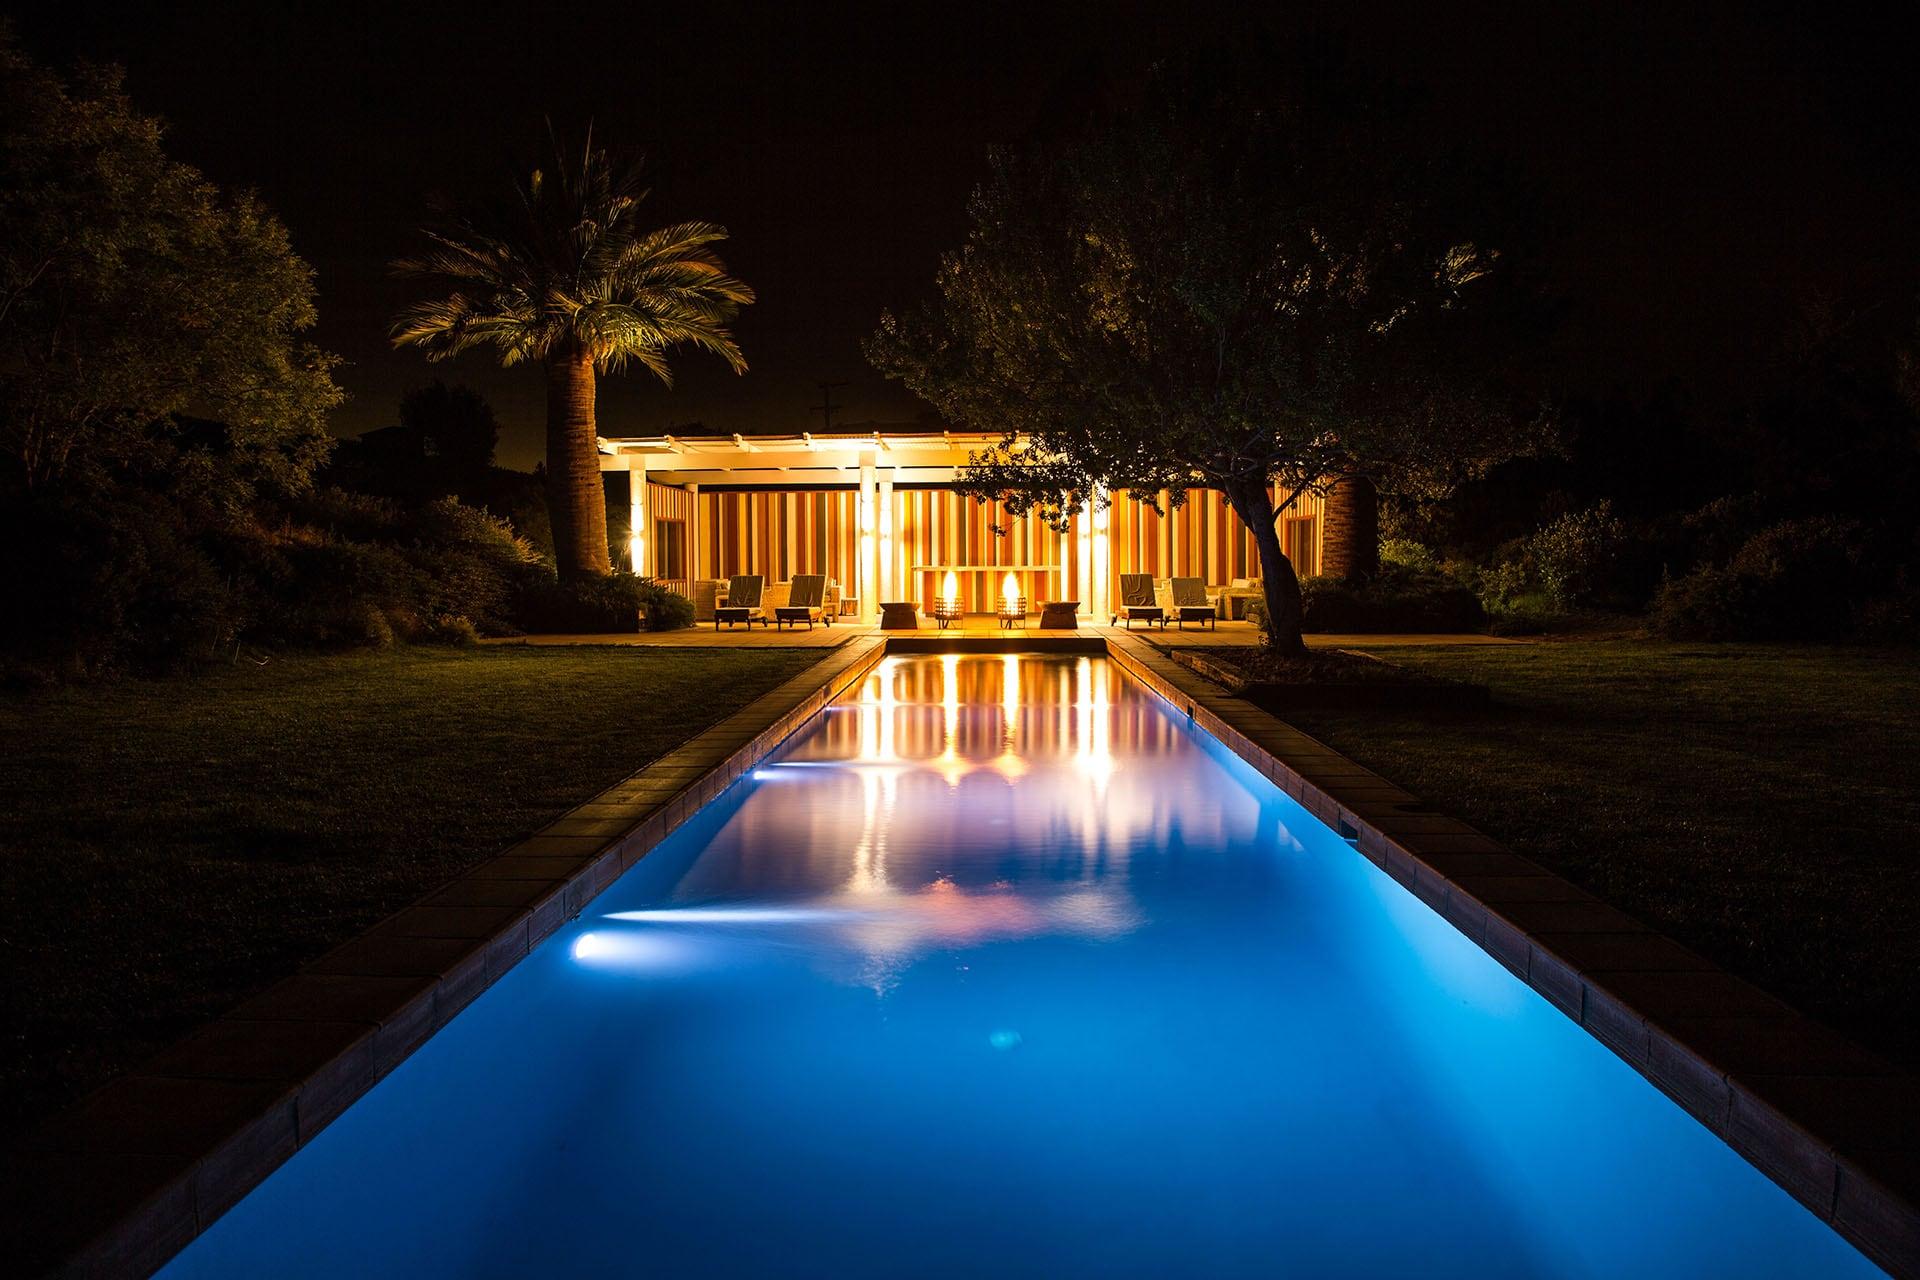 Matetic-La-Casona-pool-night